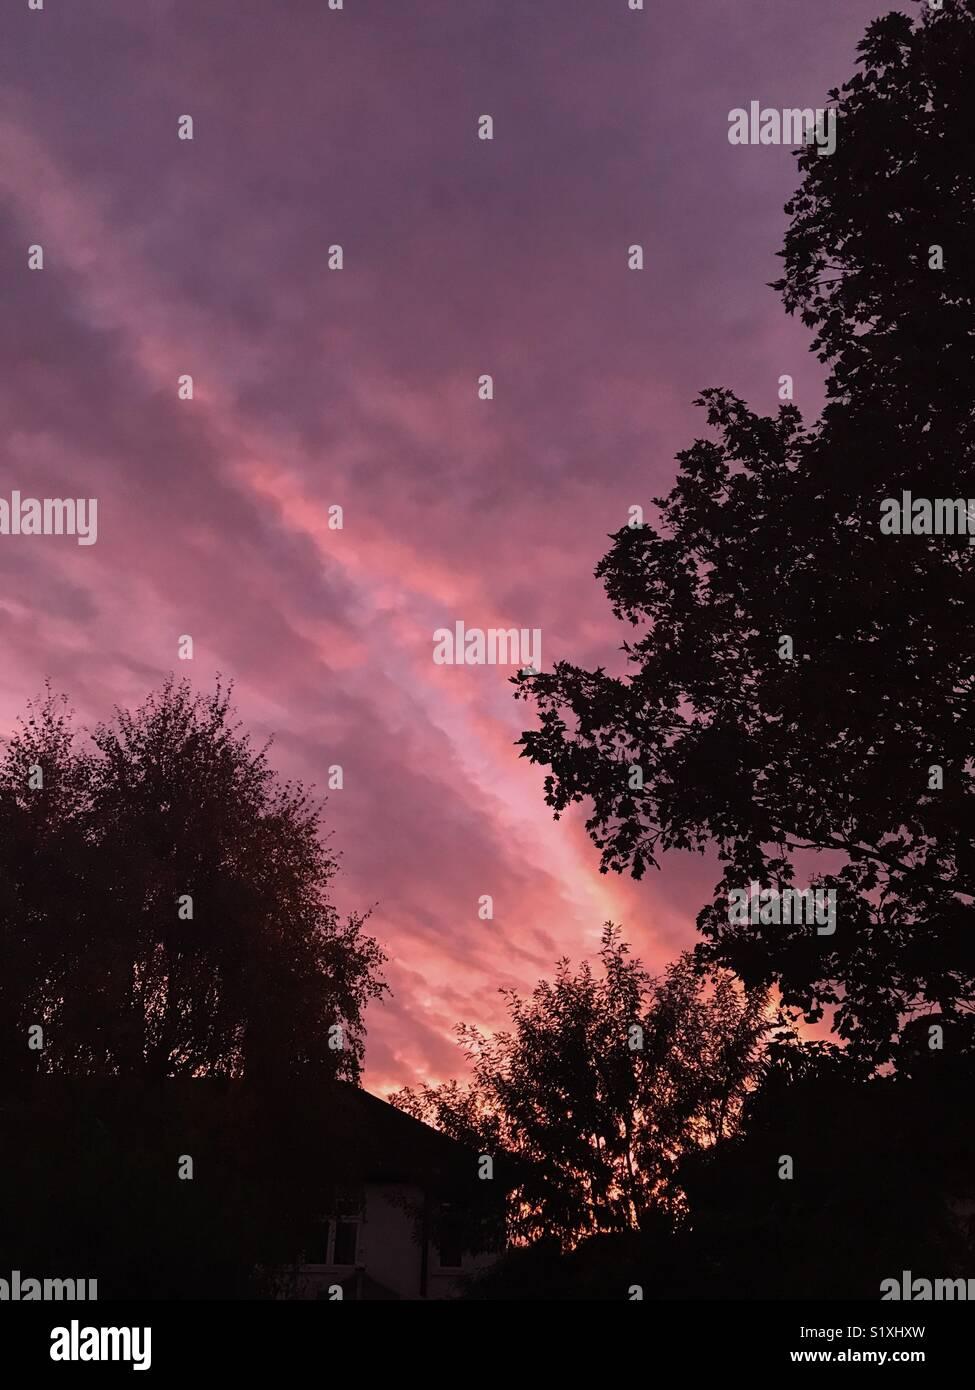 Colourful sunset - Stock Image